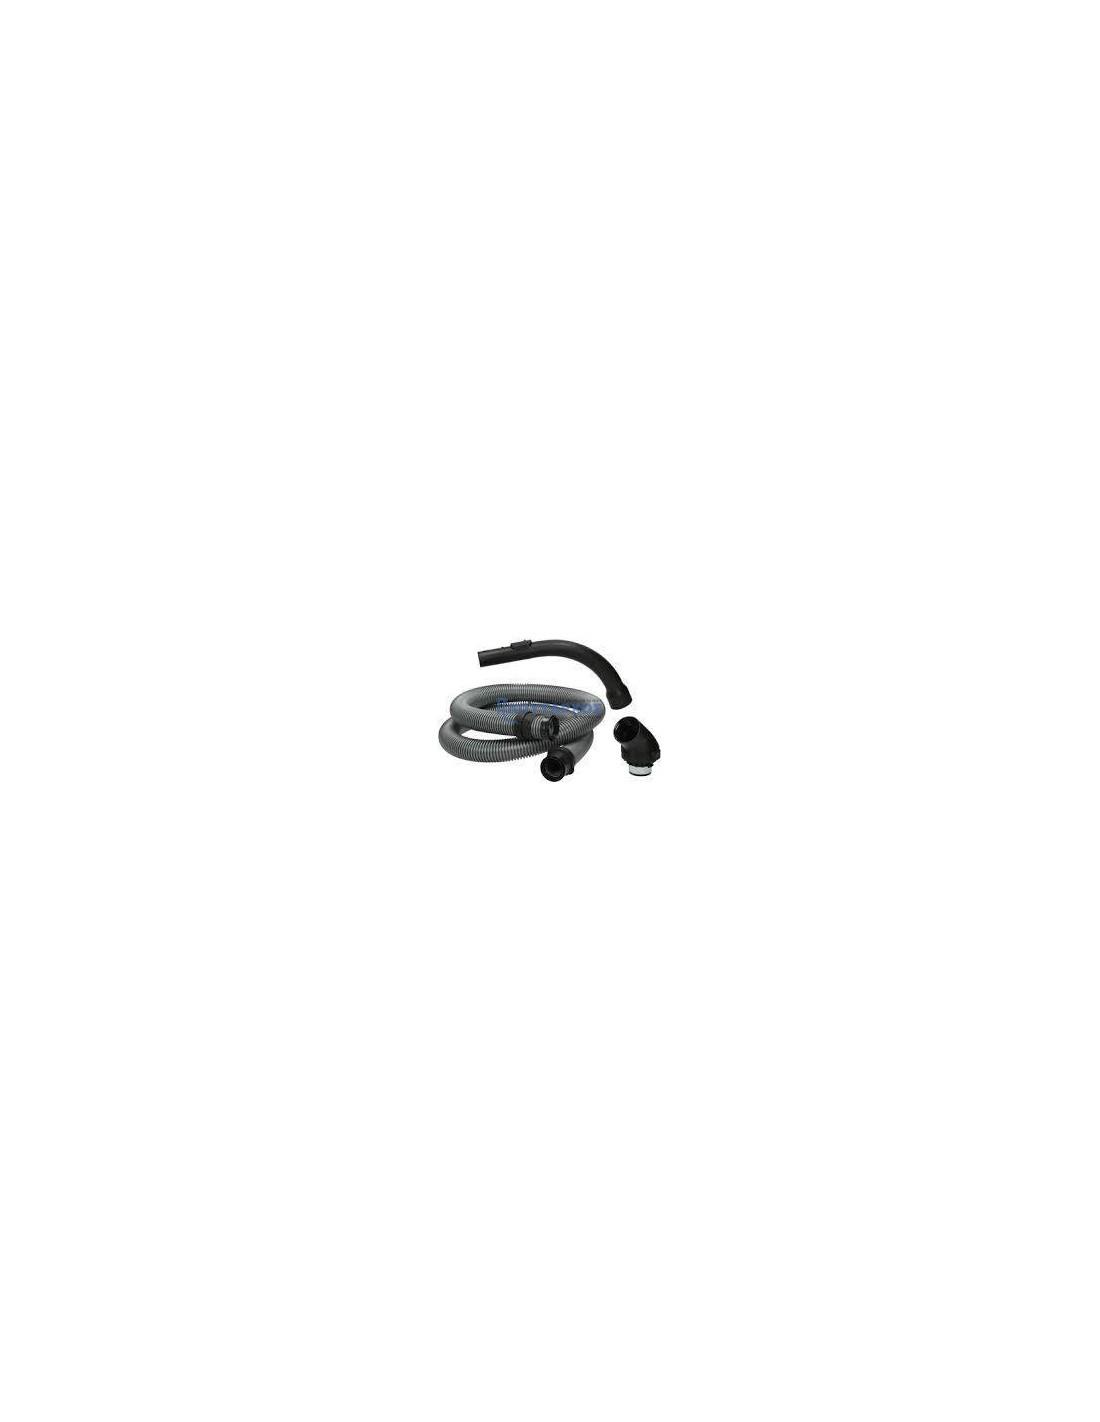 MIELE Σωλήνας (σπιράλ) αναρρόφησης σκούπας MIELE S500 S600 Σωλήνες  Ηλεκτρικής Σκούπας ... 5187eacb307